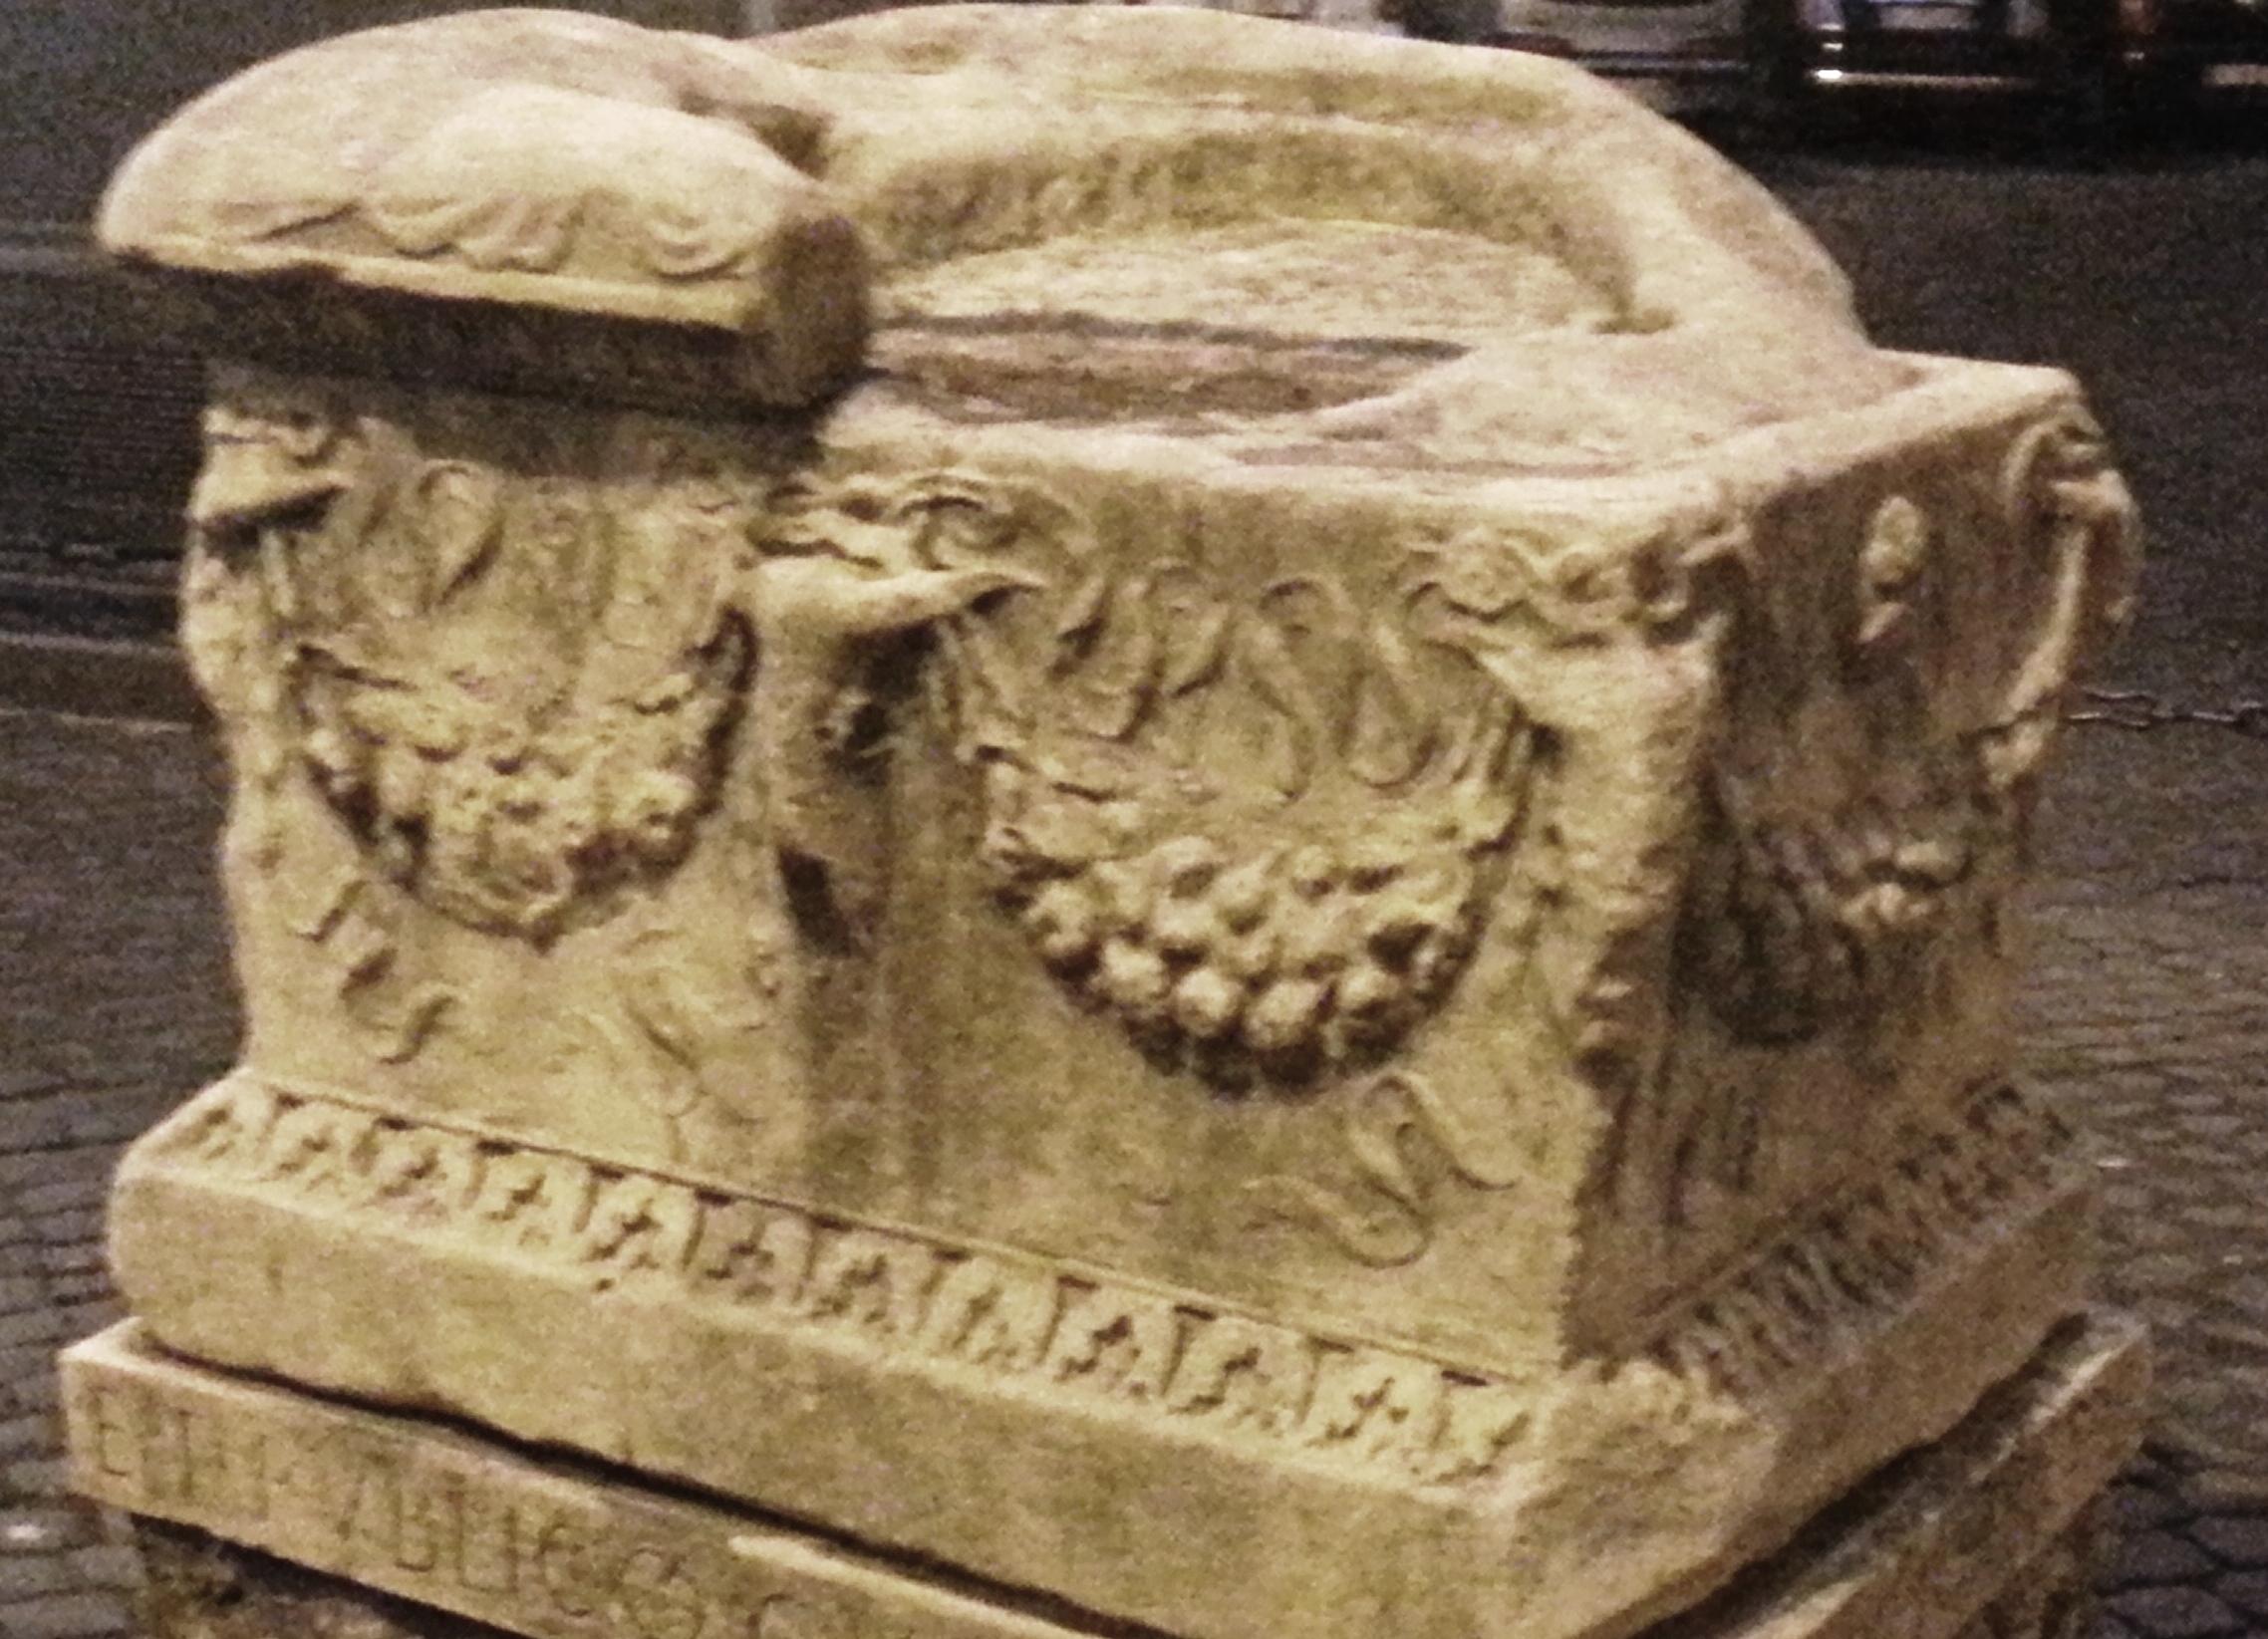 The sources of the Roman Private Ritual - SATURNIA TELLUS